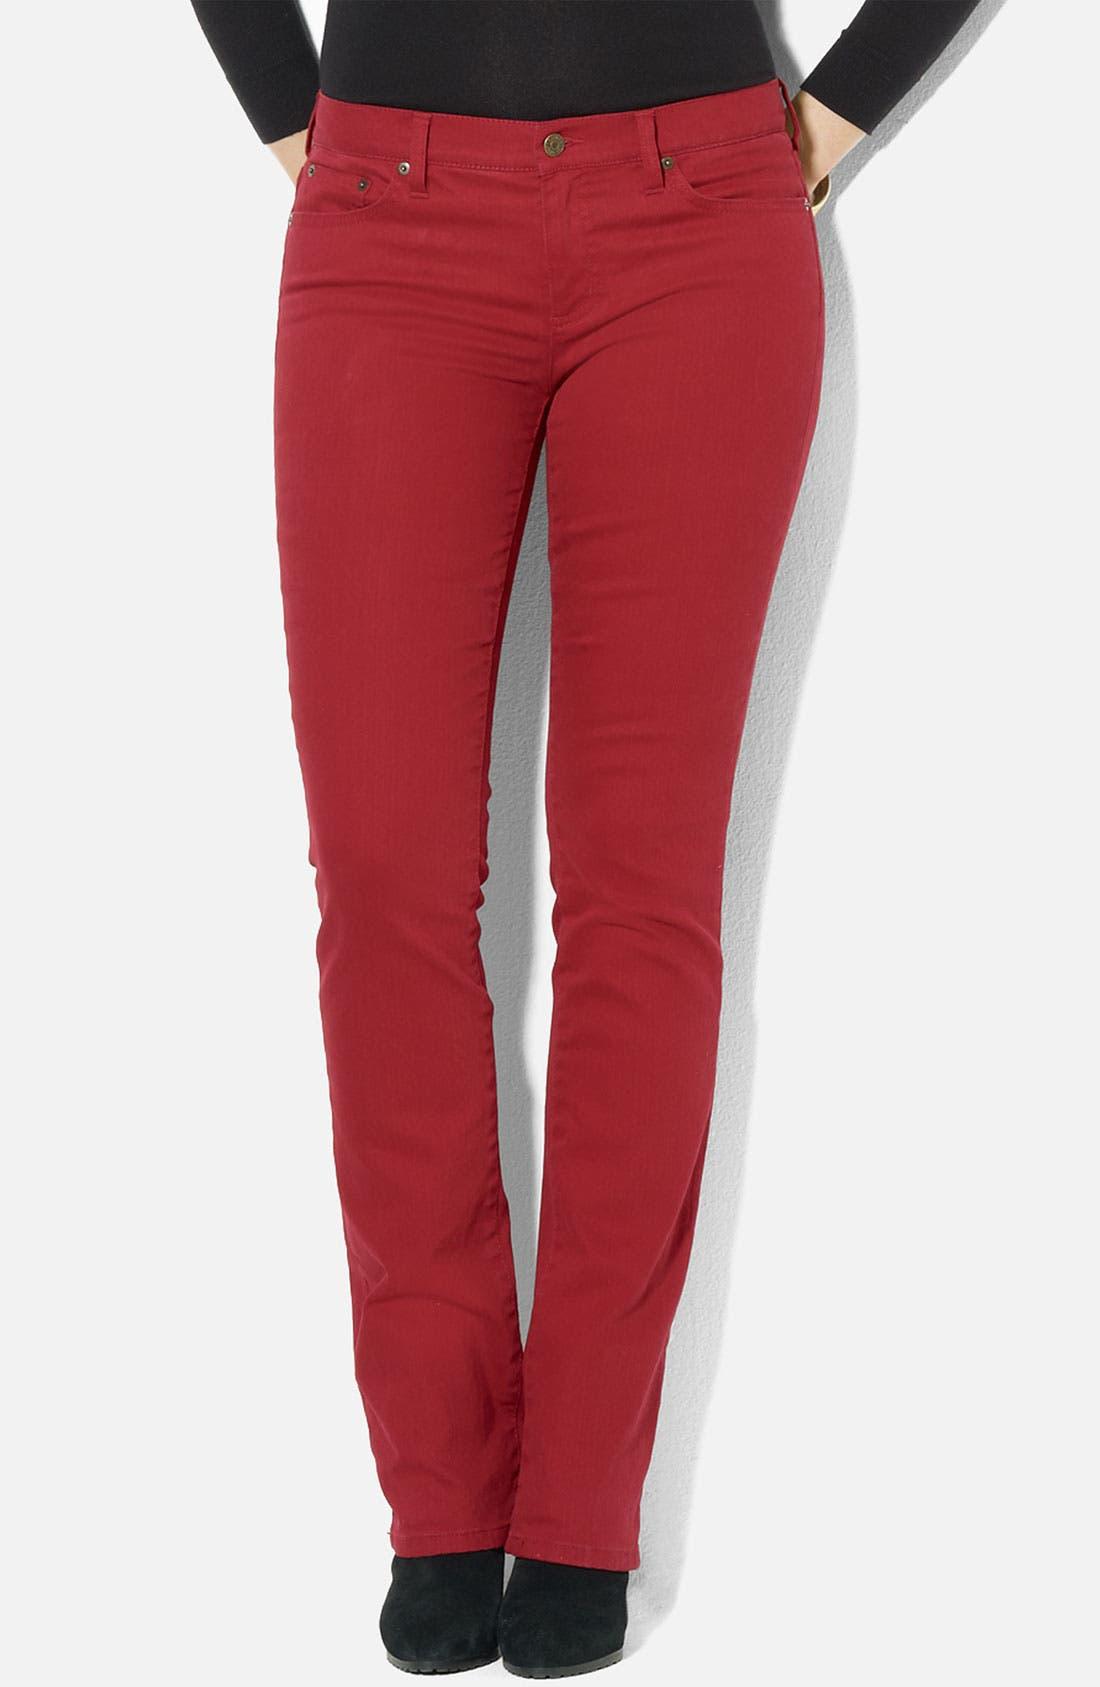 Alternate Image 1 Selected - Lauren Ralph Lauren Slim Straight Leg Colored Jeans (Petite) (Online Exclusive)